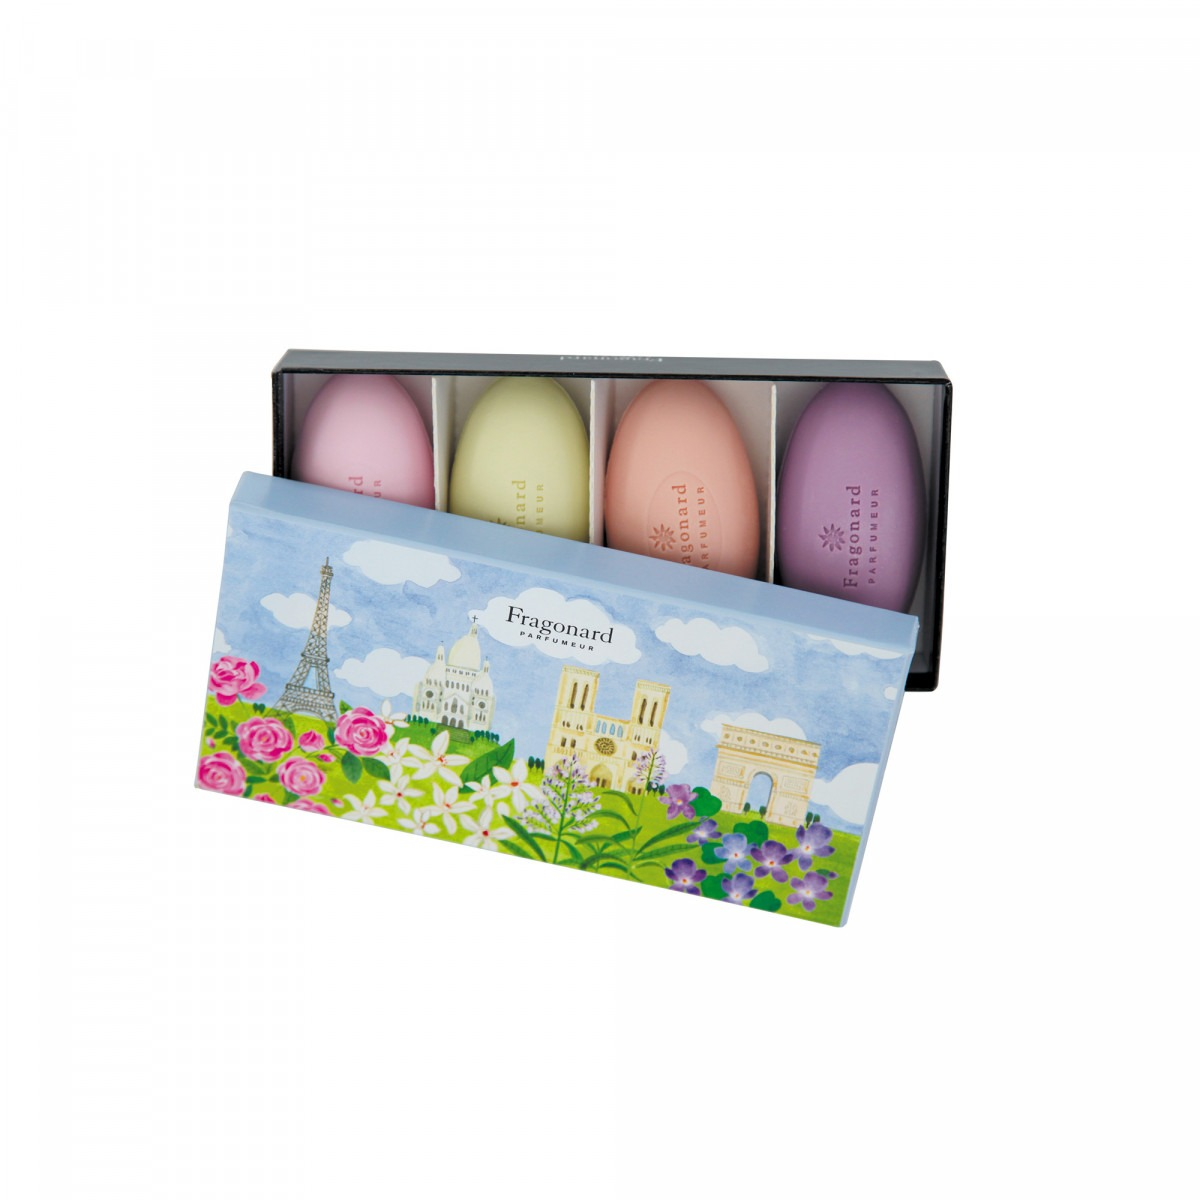 Fragonard guest soap box Paris